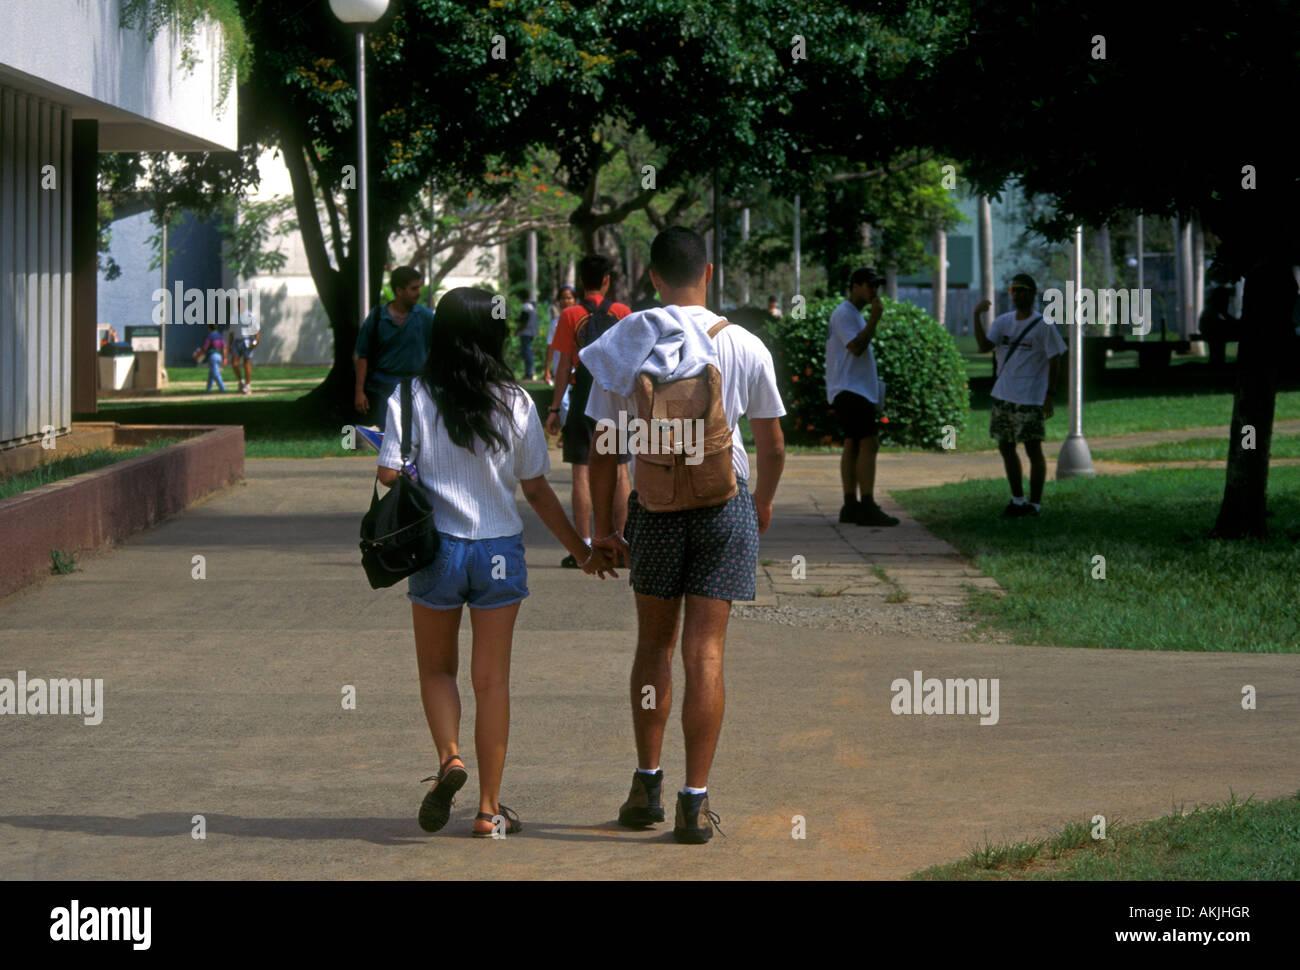 Puerto Ricans, Puerto Rican students, college students, university students, students, campus, University of Puerto - Stock Image